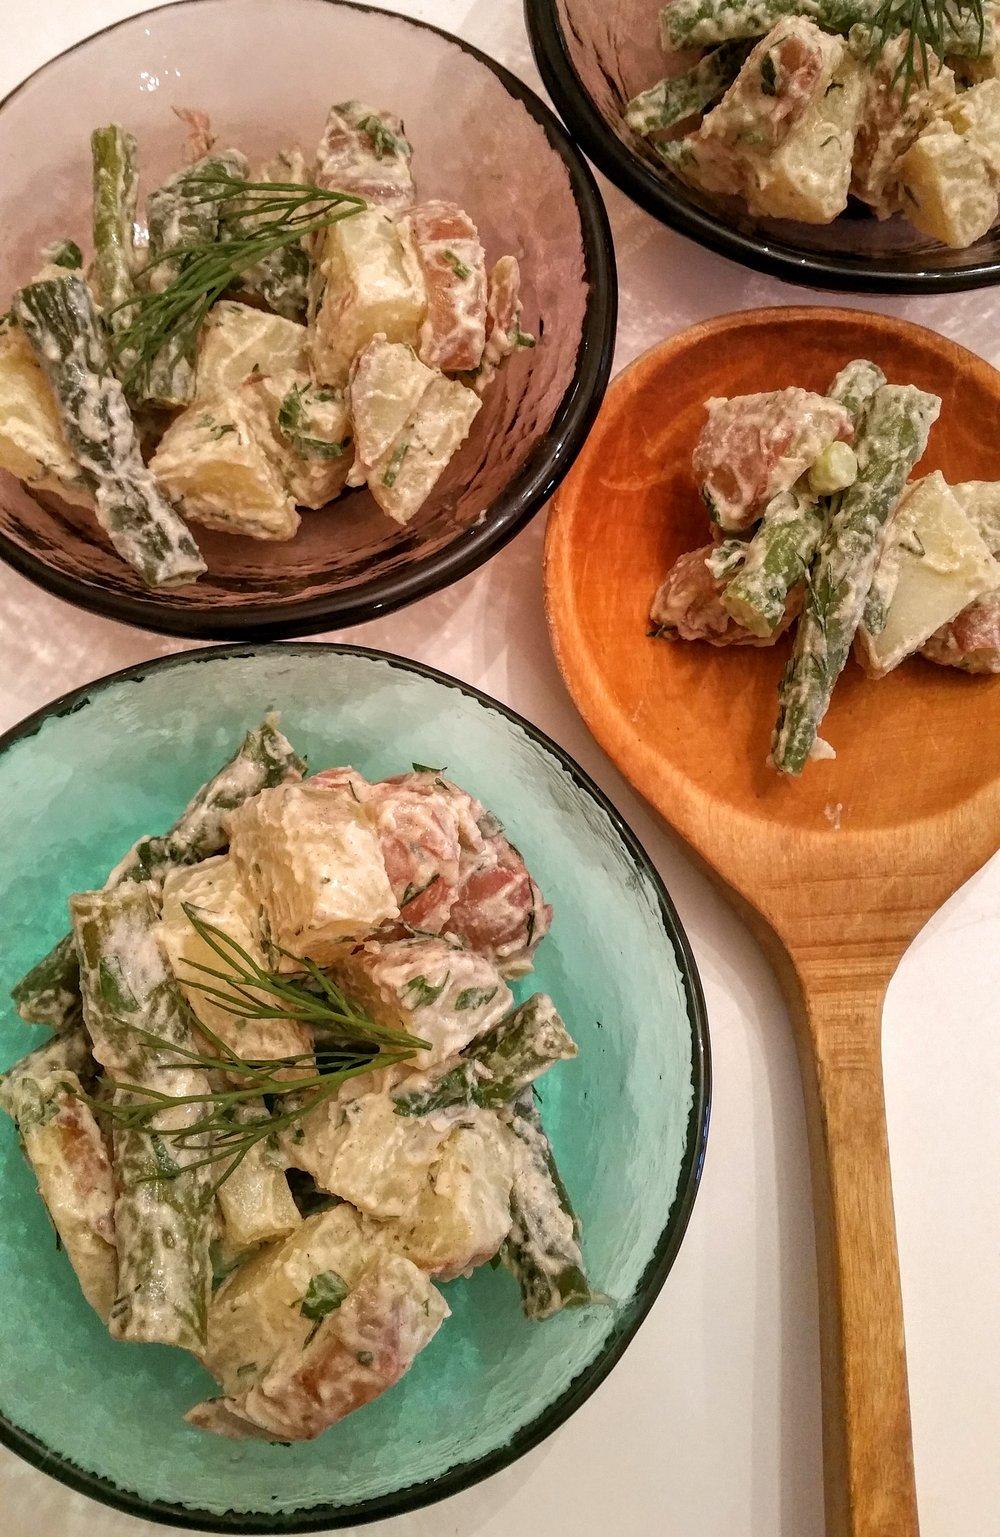 Potato Salad + Roasted Asparagus